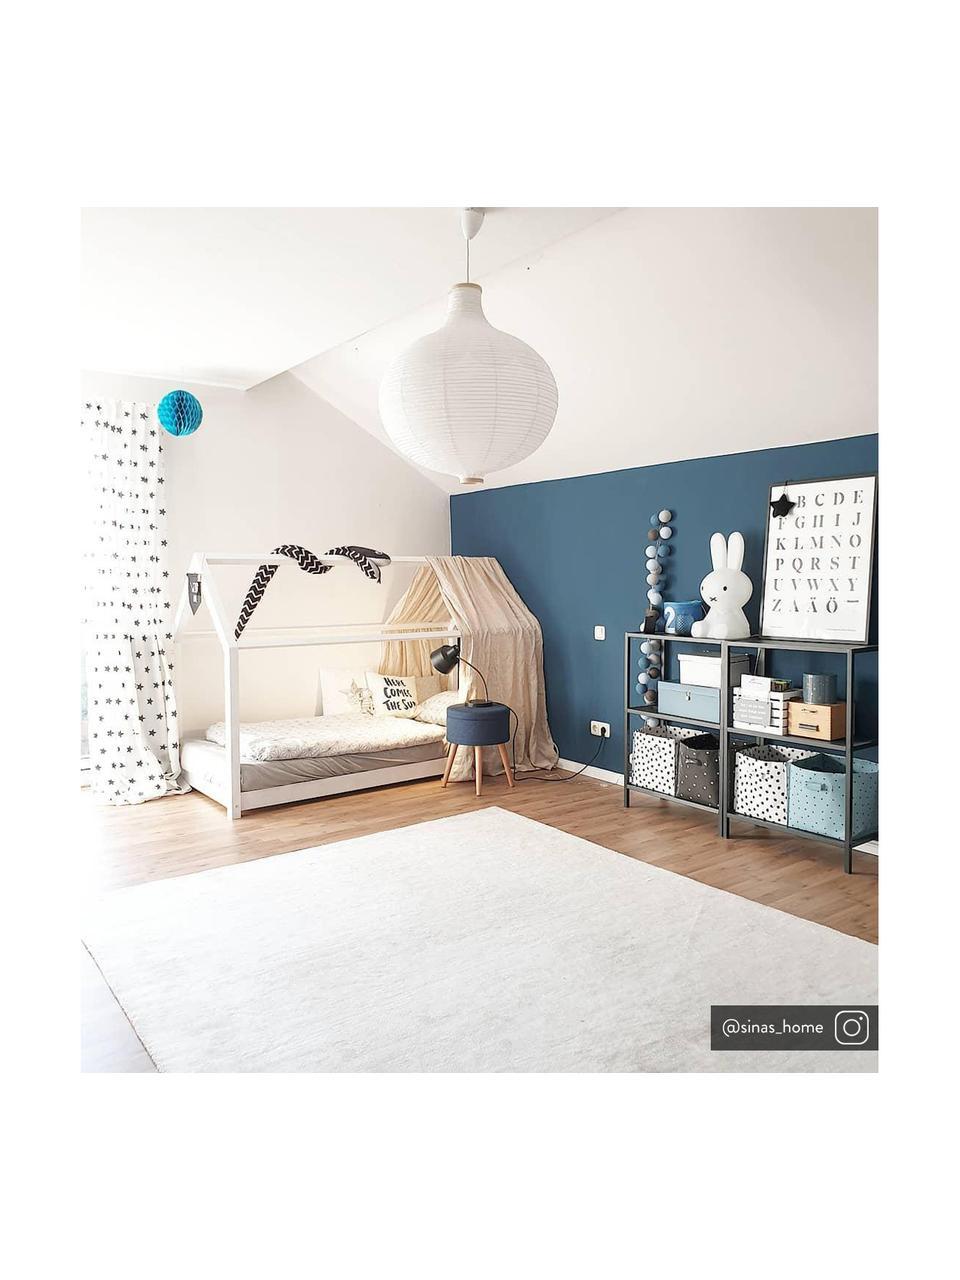 LED-Lichterkette Bellin, 320 cm, 20 Lampions, Lampions: Baumwolle, Blau, Hellblau, Dunkelblau, Weiß, L 320 cm